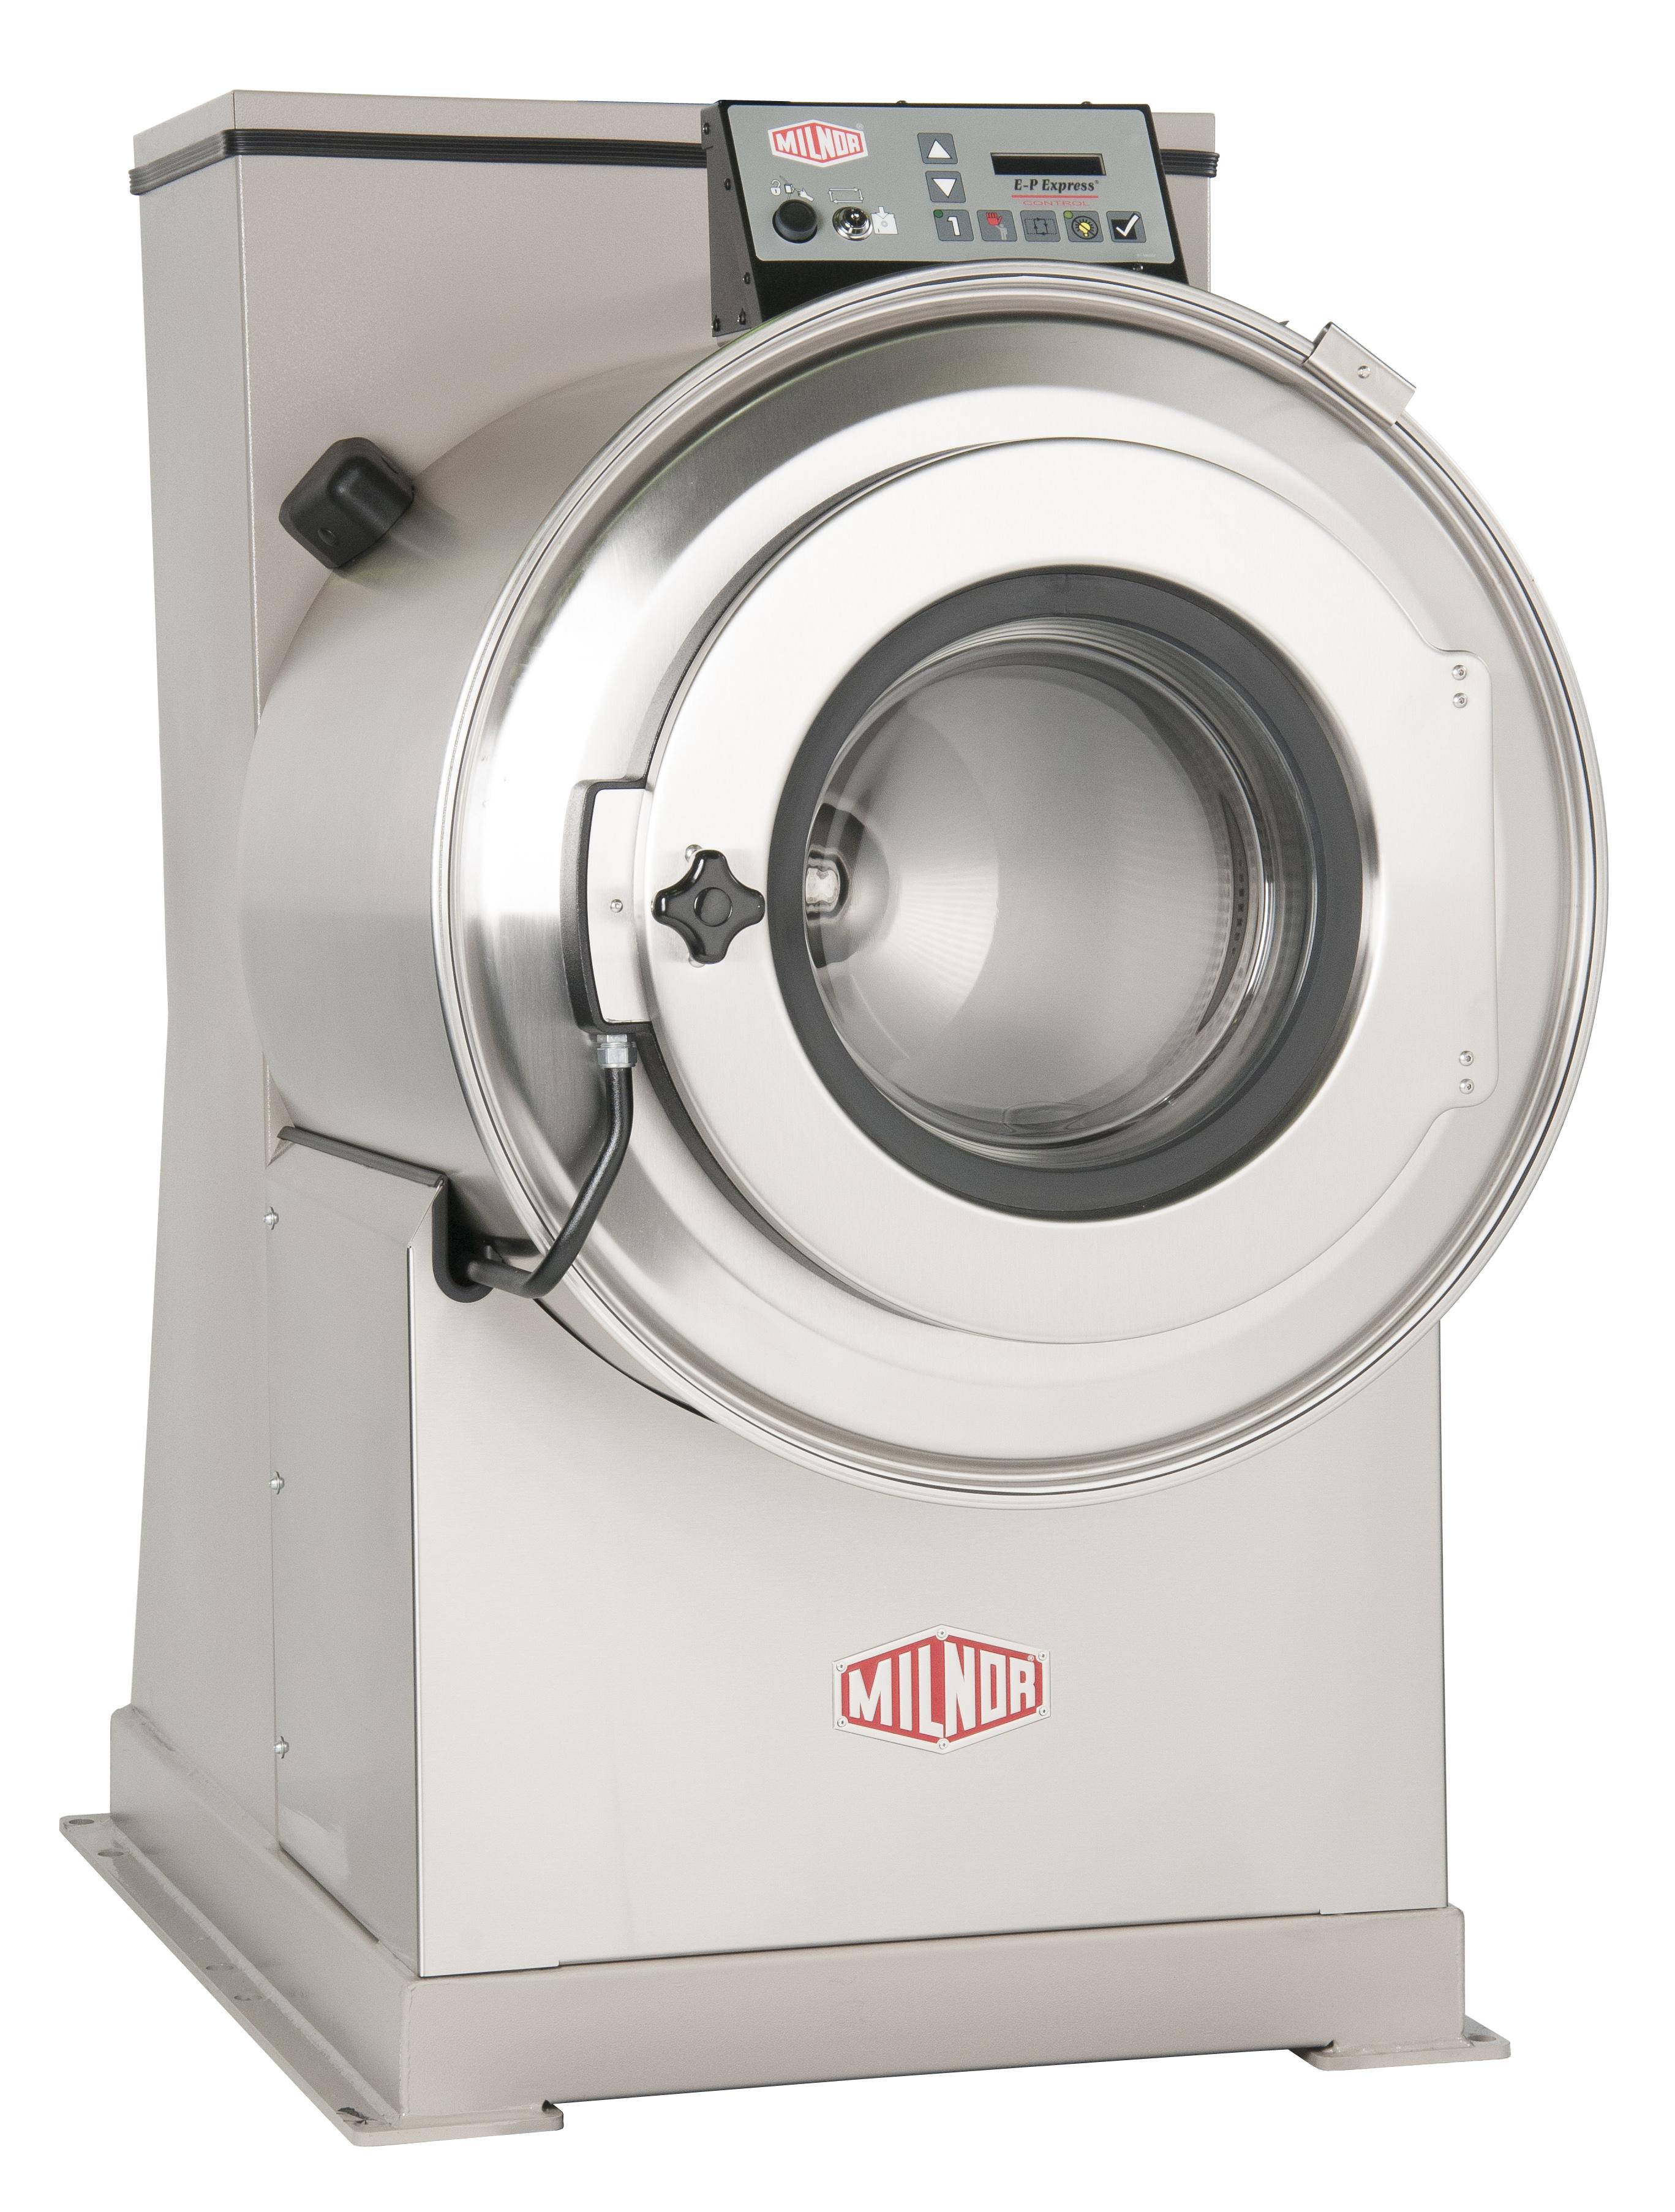 Milnor Washer Parts ~ T pellerin milnor corporation